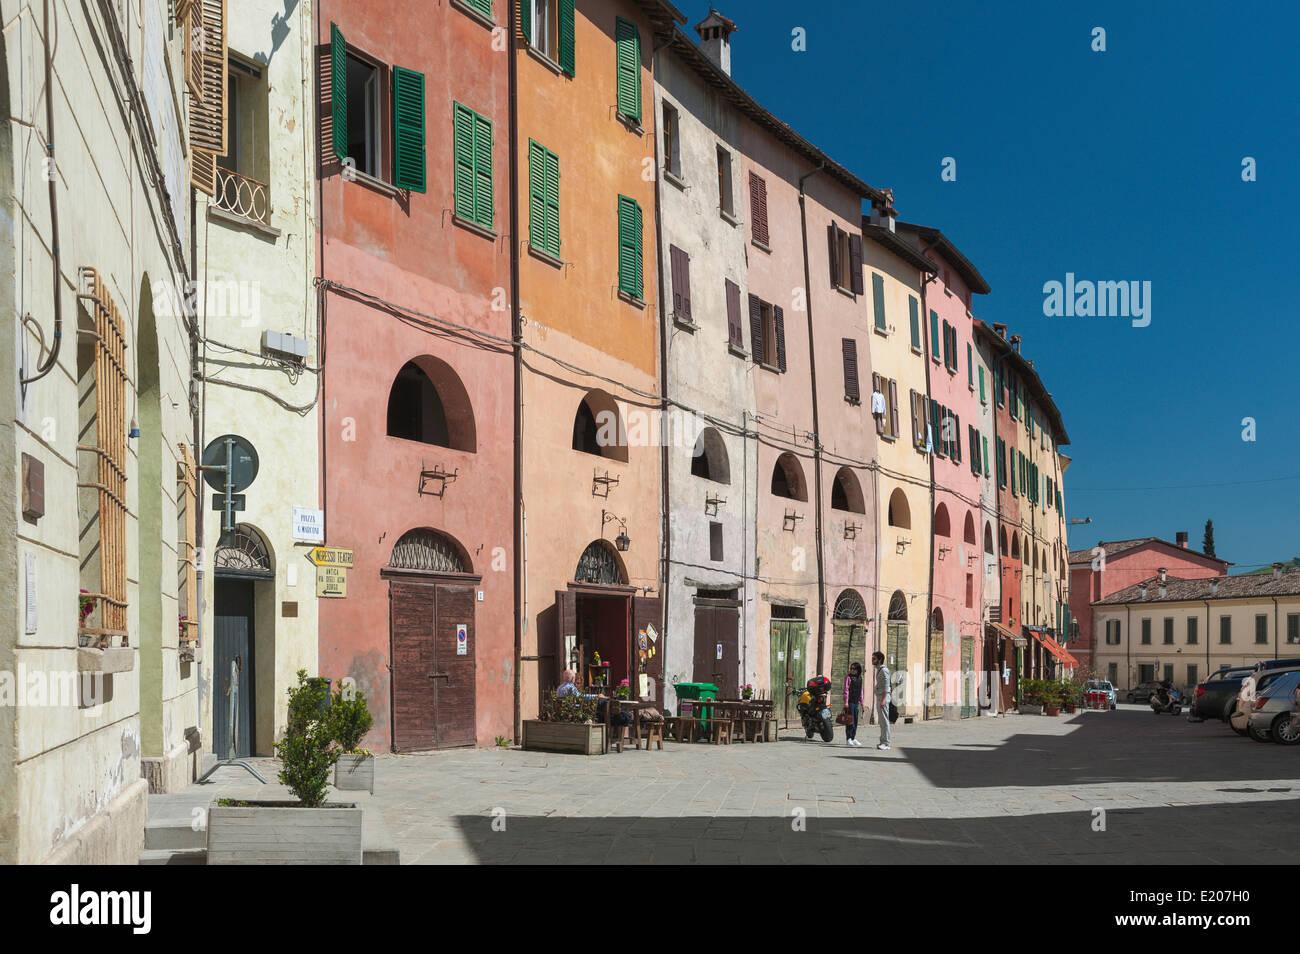 Historic row of houses with portico on the first floor, 15th century, Piazza Guglielmo Marconi, Brisighella, Emilia - Stock Image